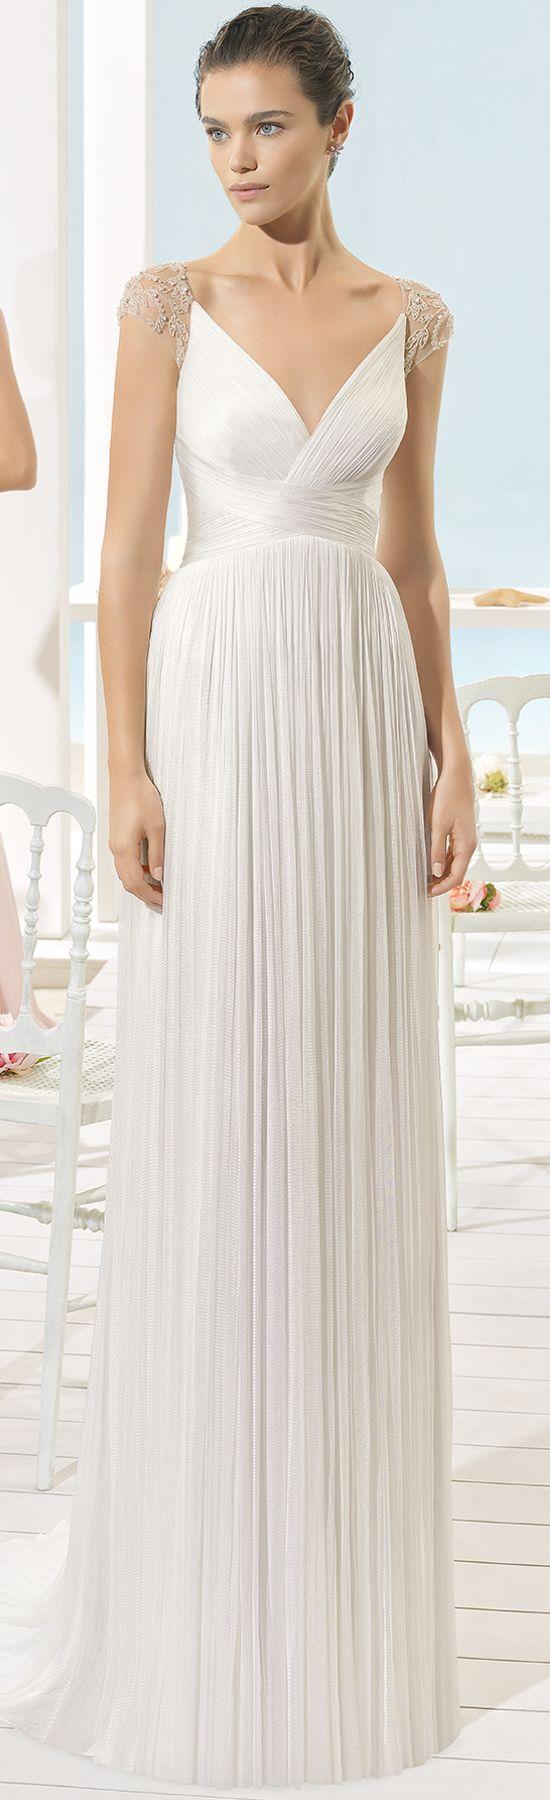 XANT vestido de novia Aire Barcelona 2017